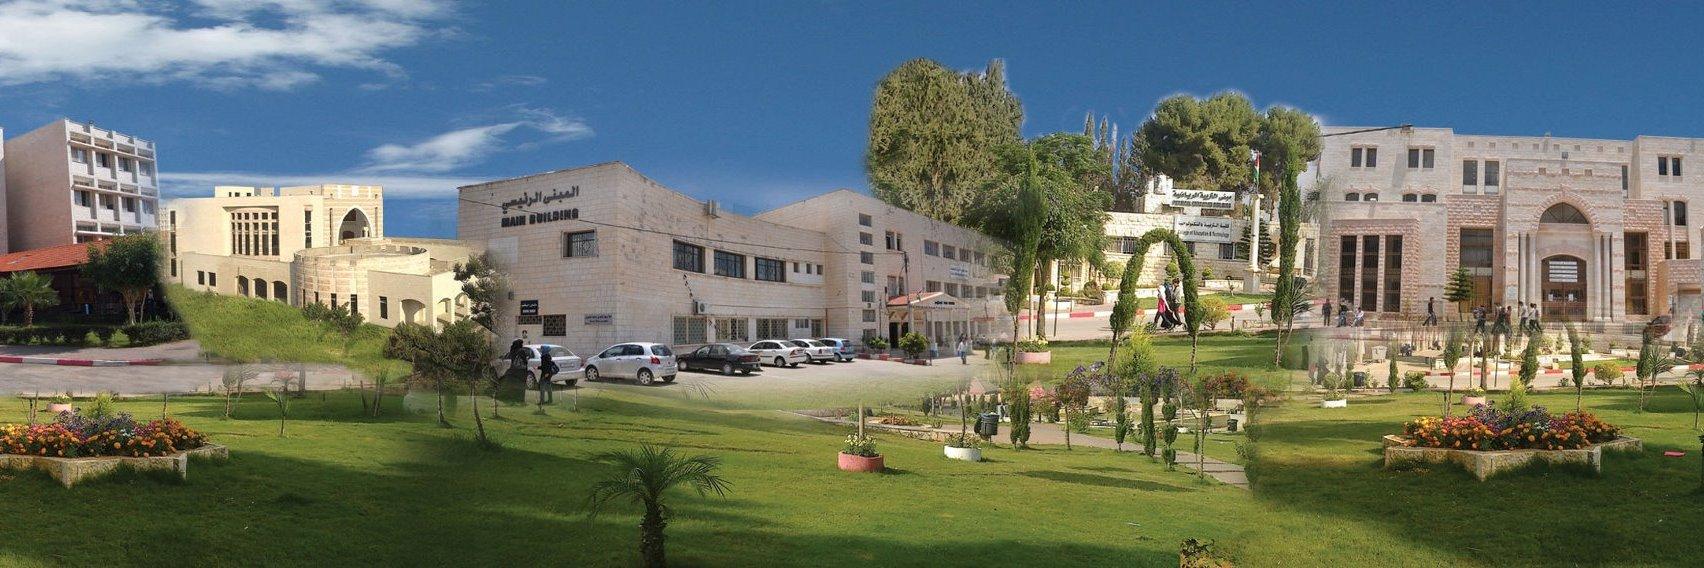 Palestine Technical University Kadoorie's official Twitter account